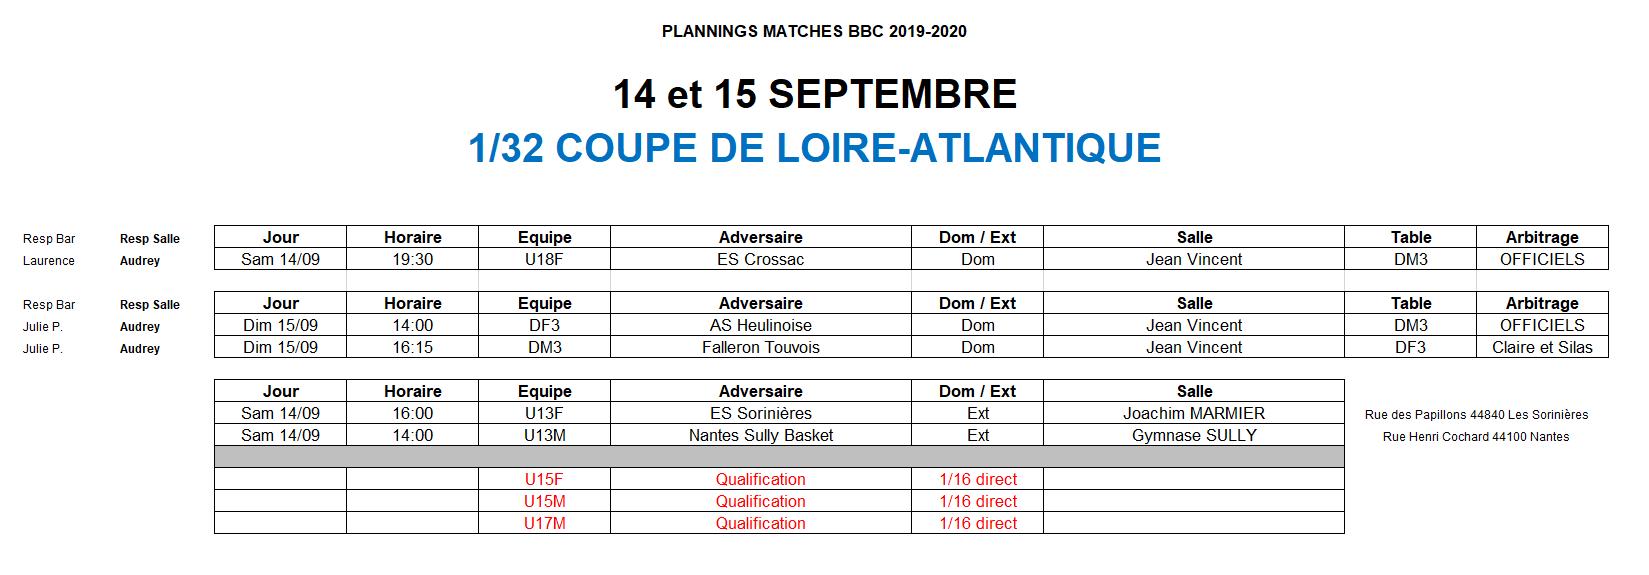 Planning-match-14-15-septembre